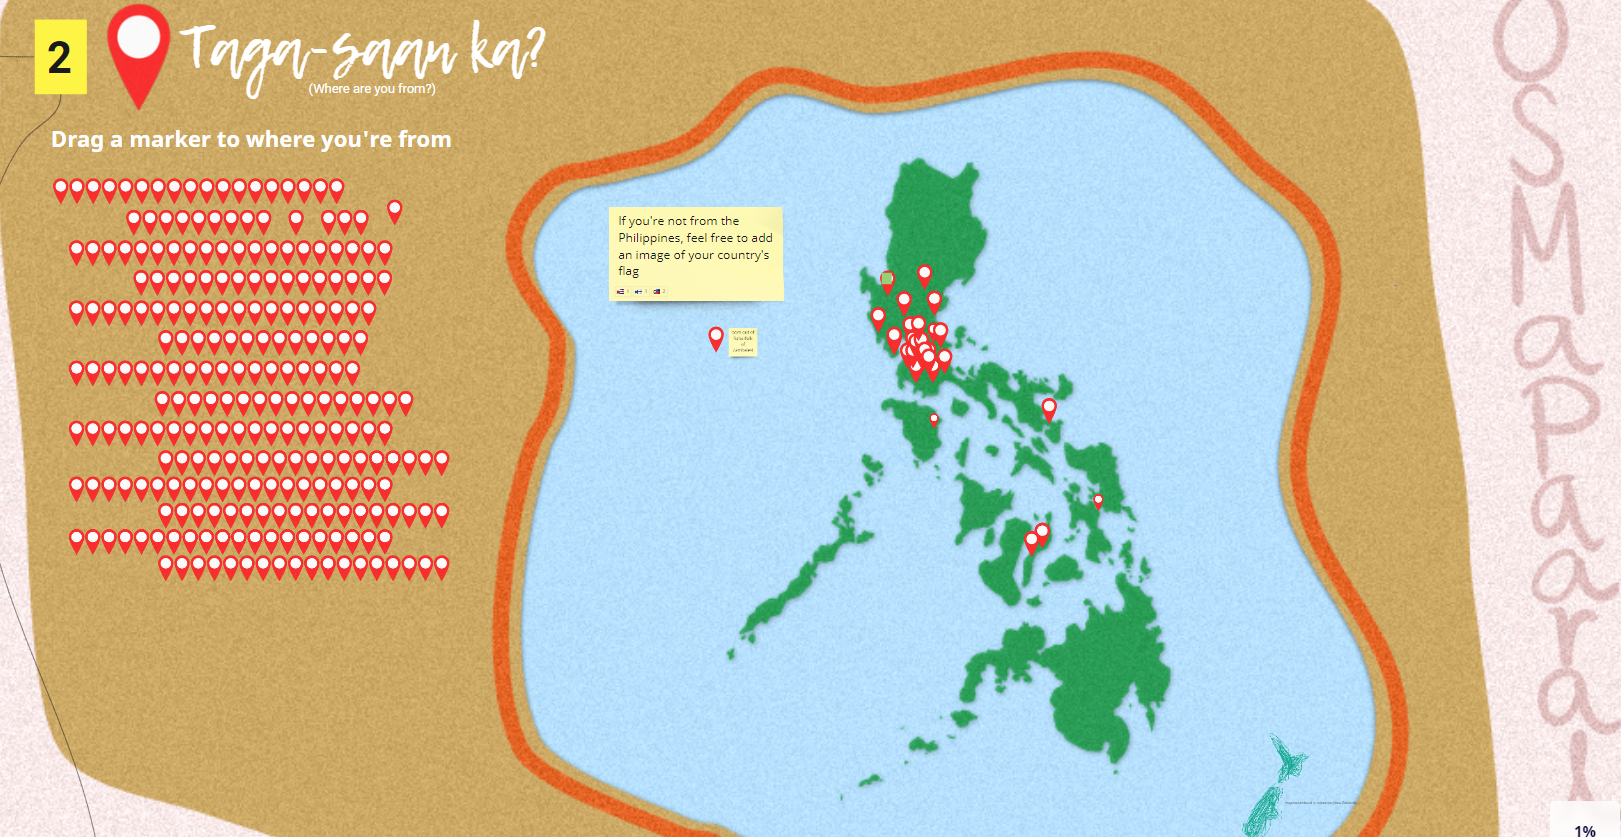 Taga-saan ka? (Where are you from?)